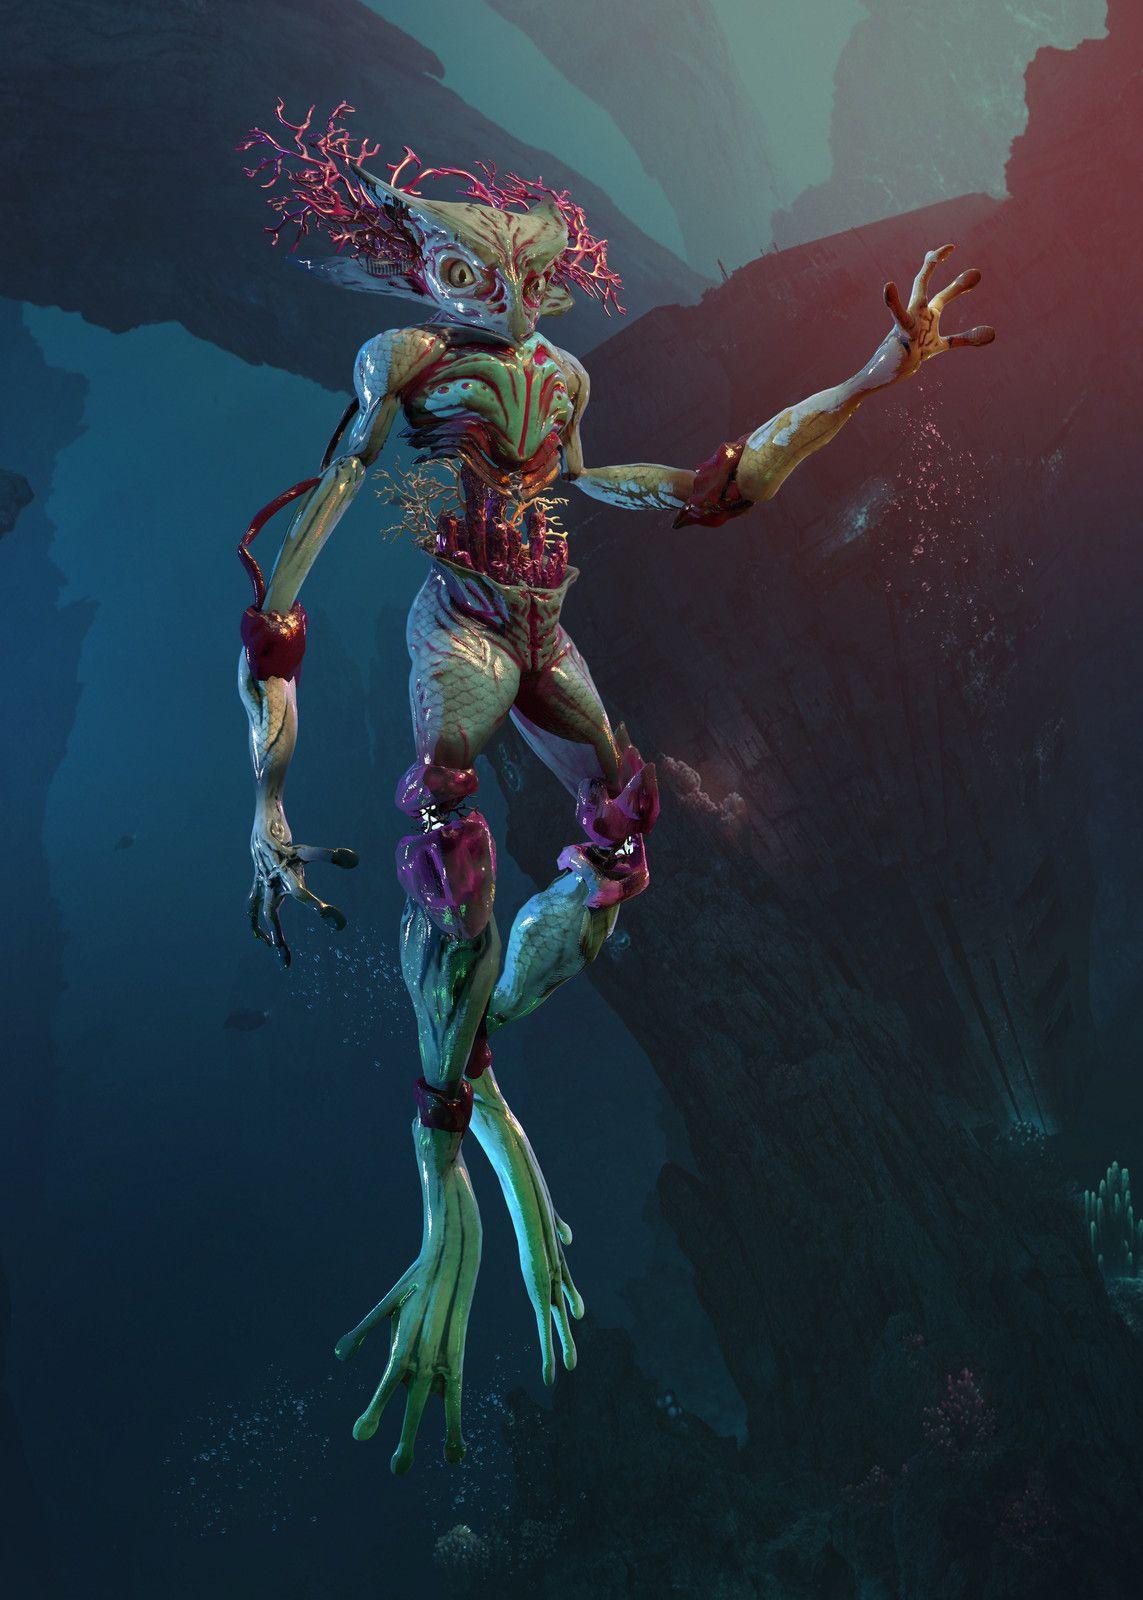 Elemental Character Water , Daniels Voitovs Artwork